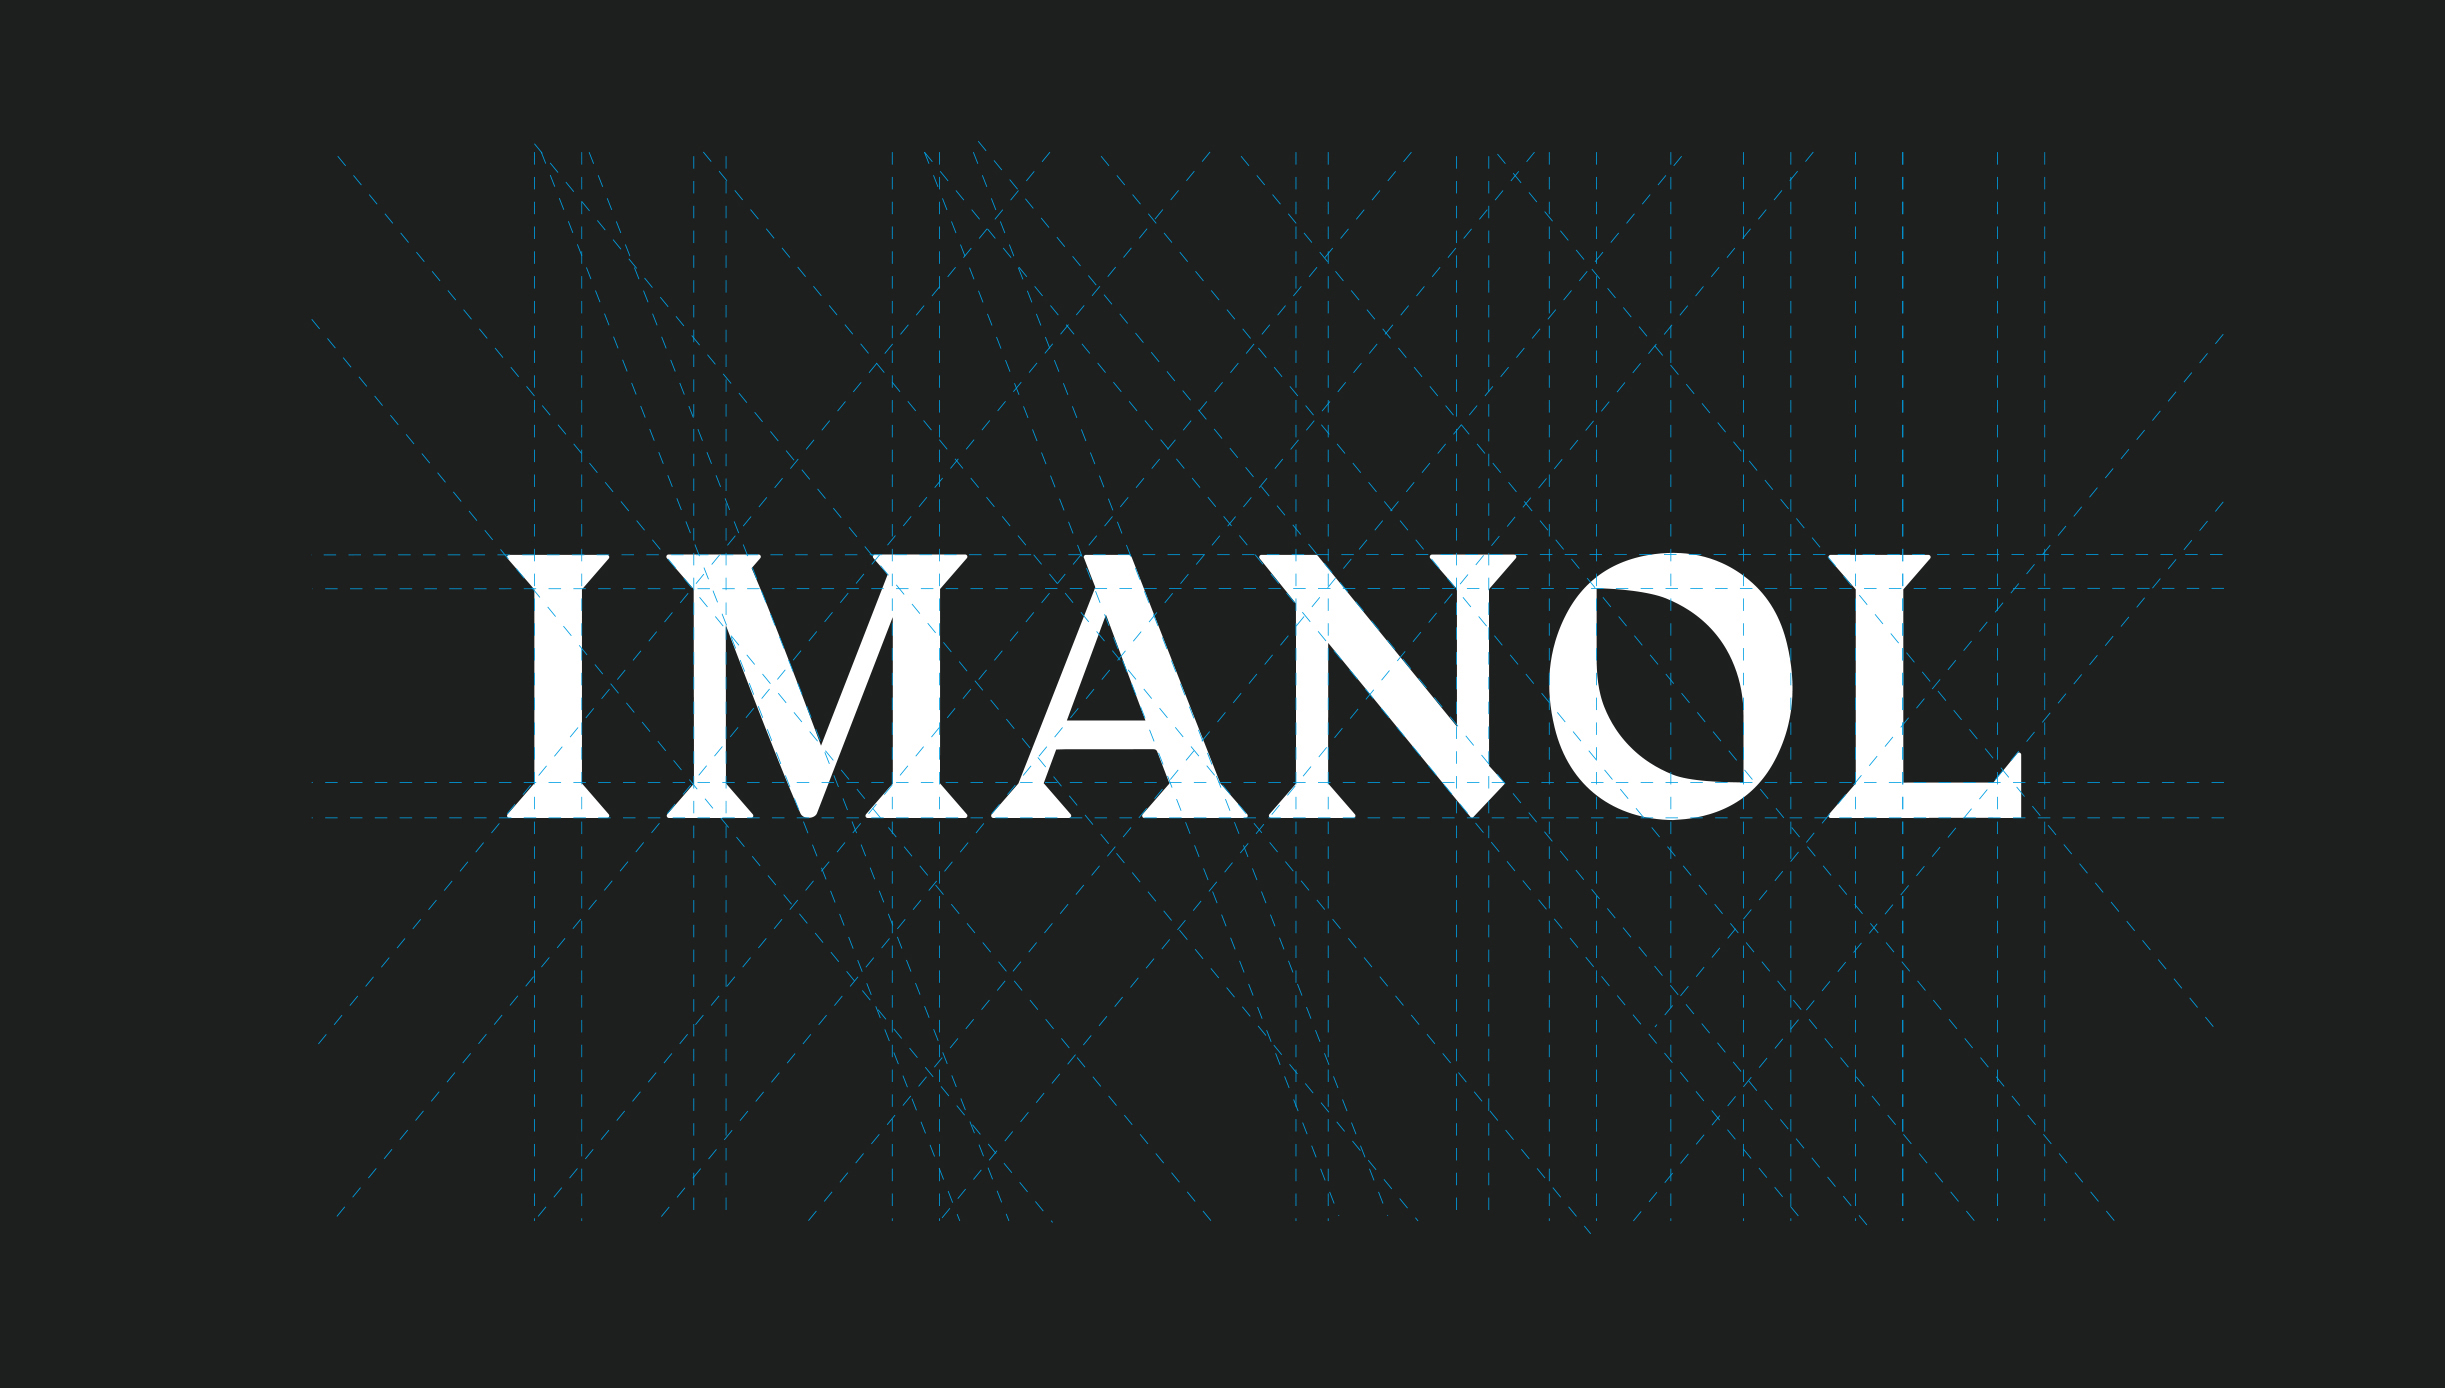 imanol-angel-espinosa-003A-2